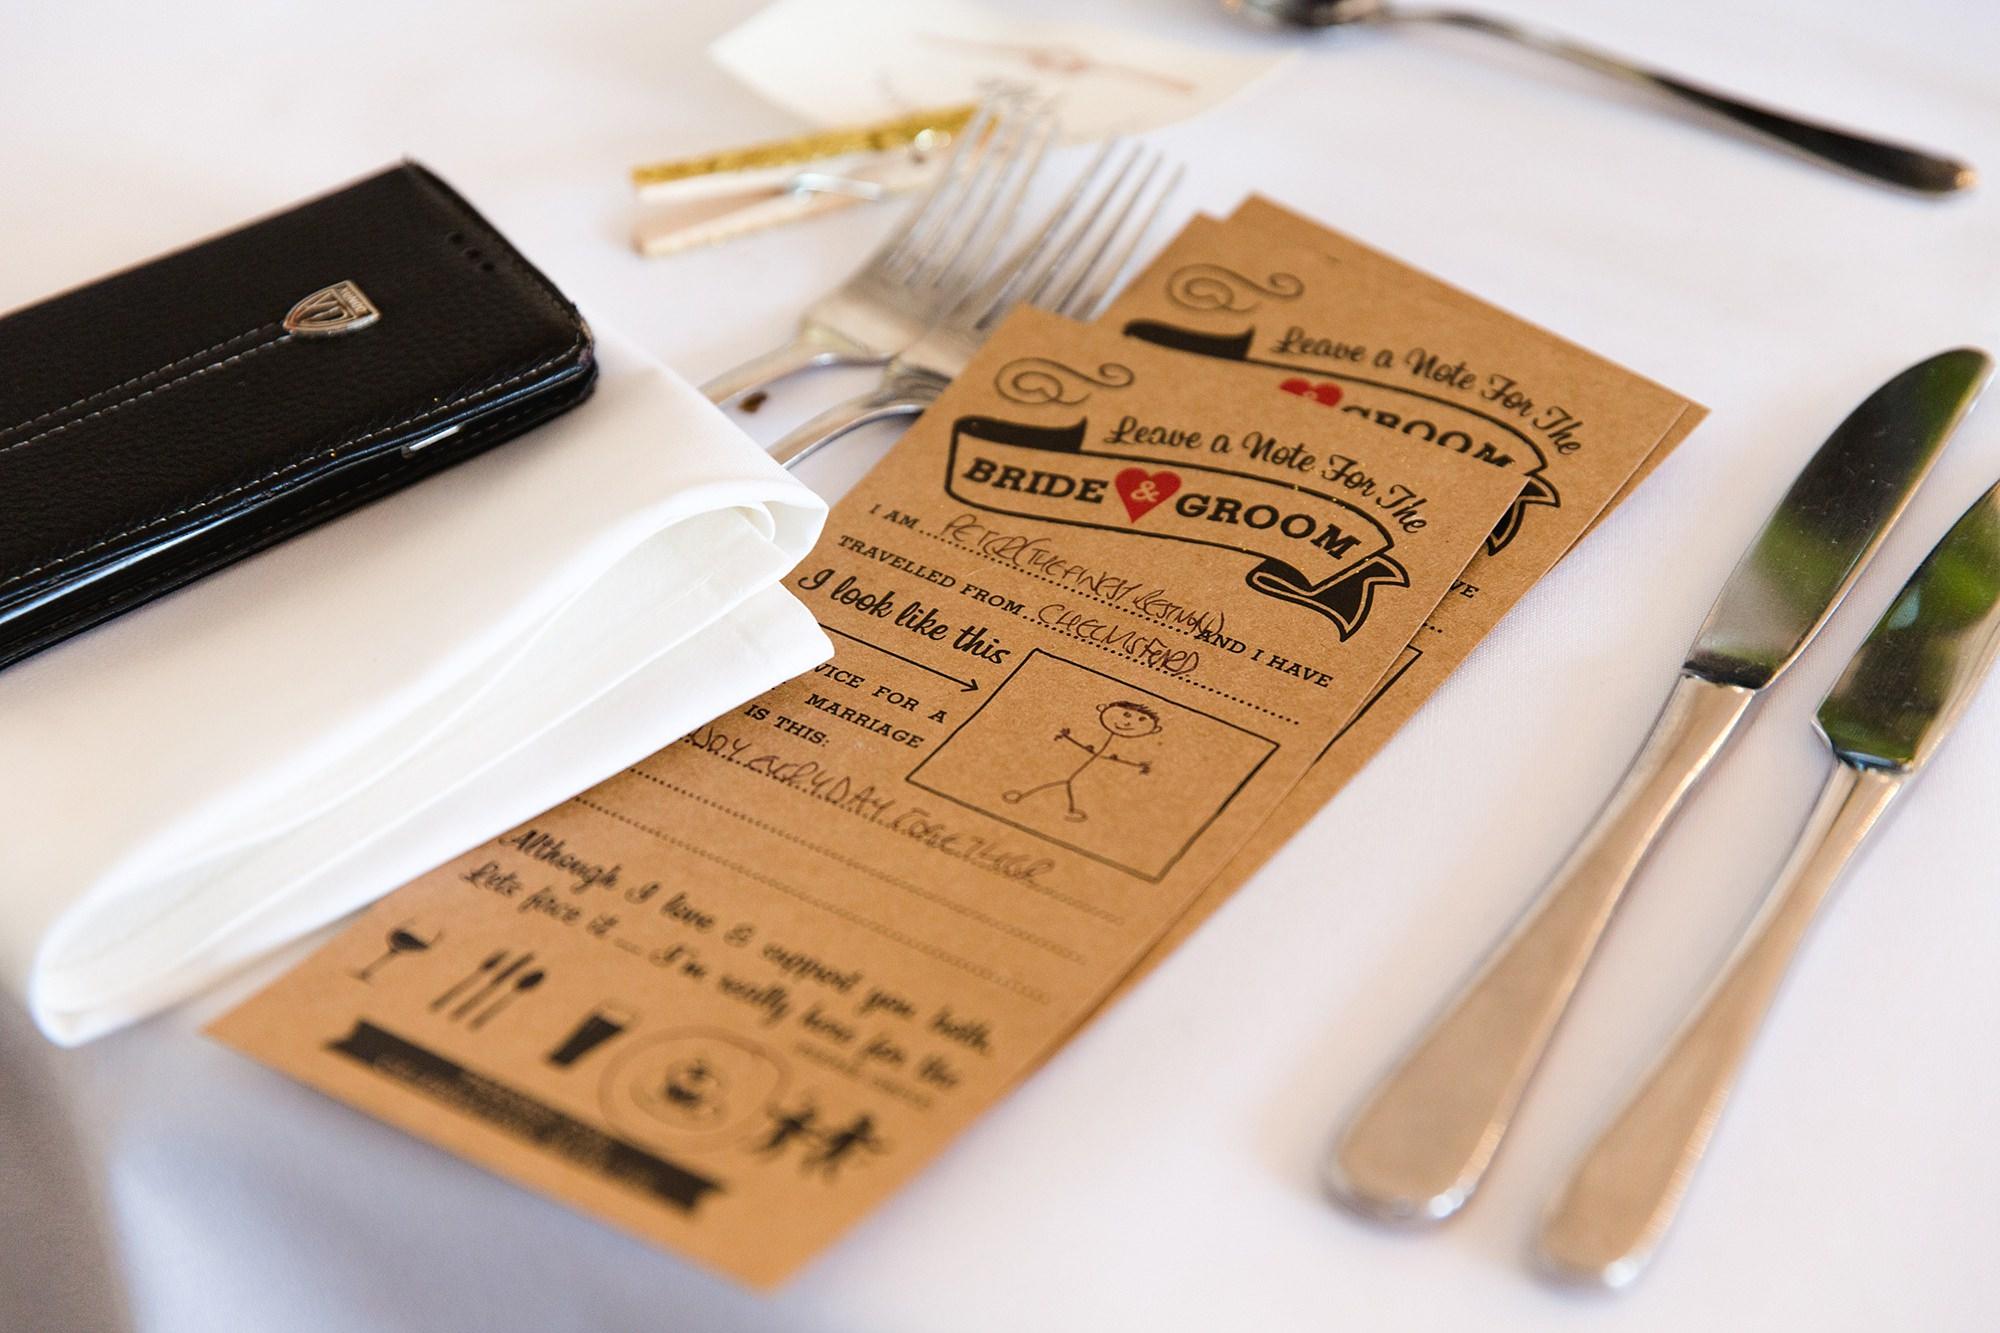 Trafalgar Tavern wedding advice for bride and groom cards